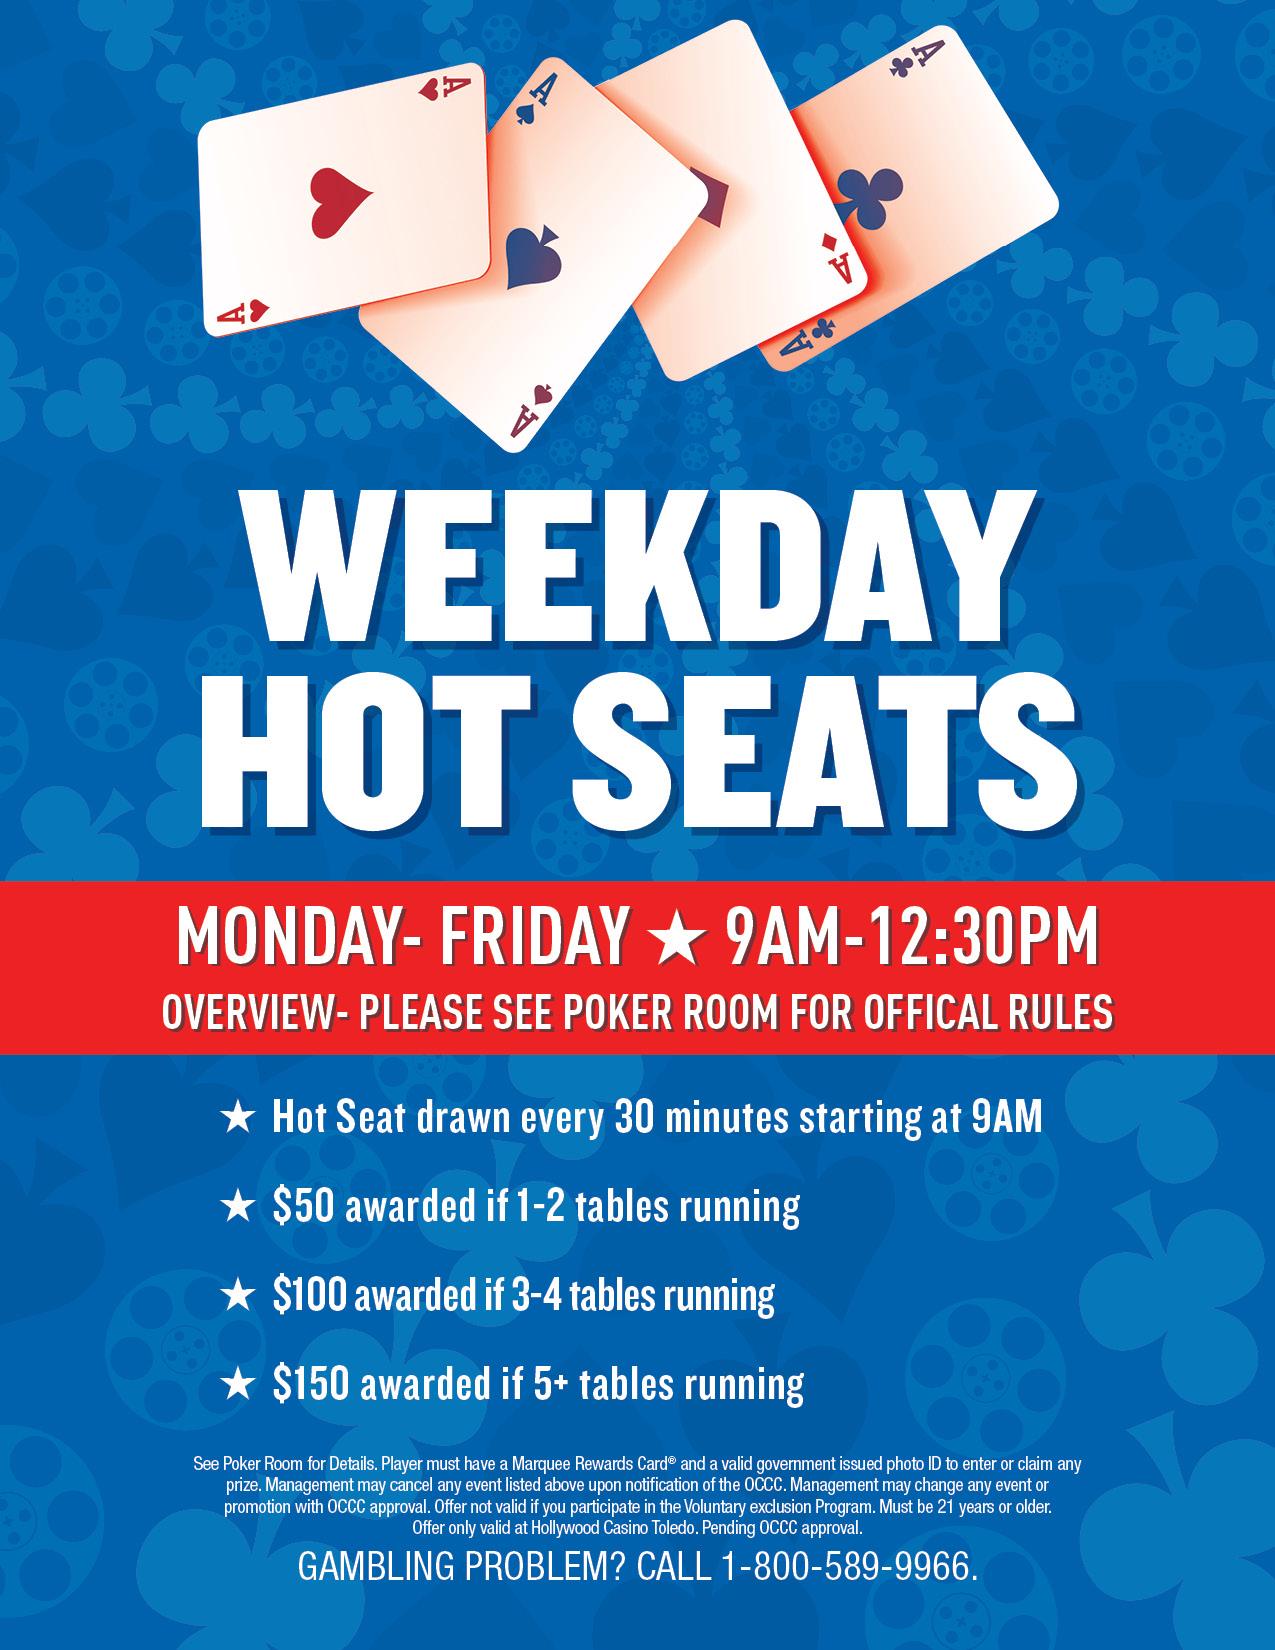 Hollywood casino toledo poker room tournament schedule 2018